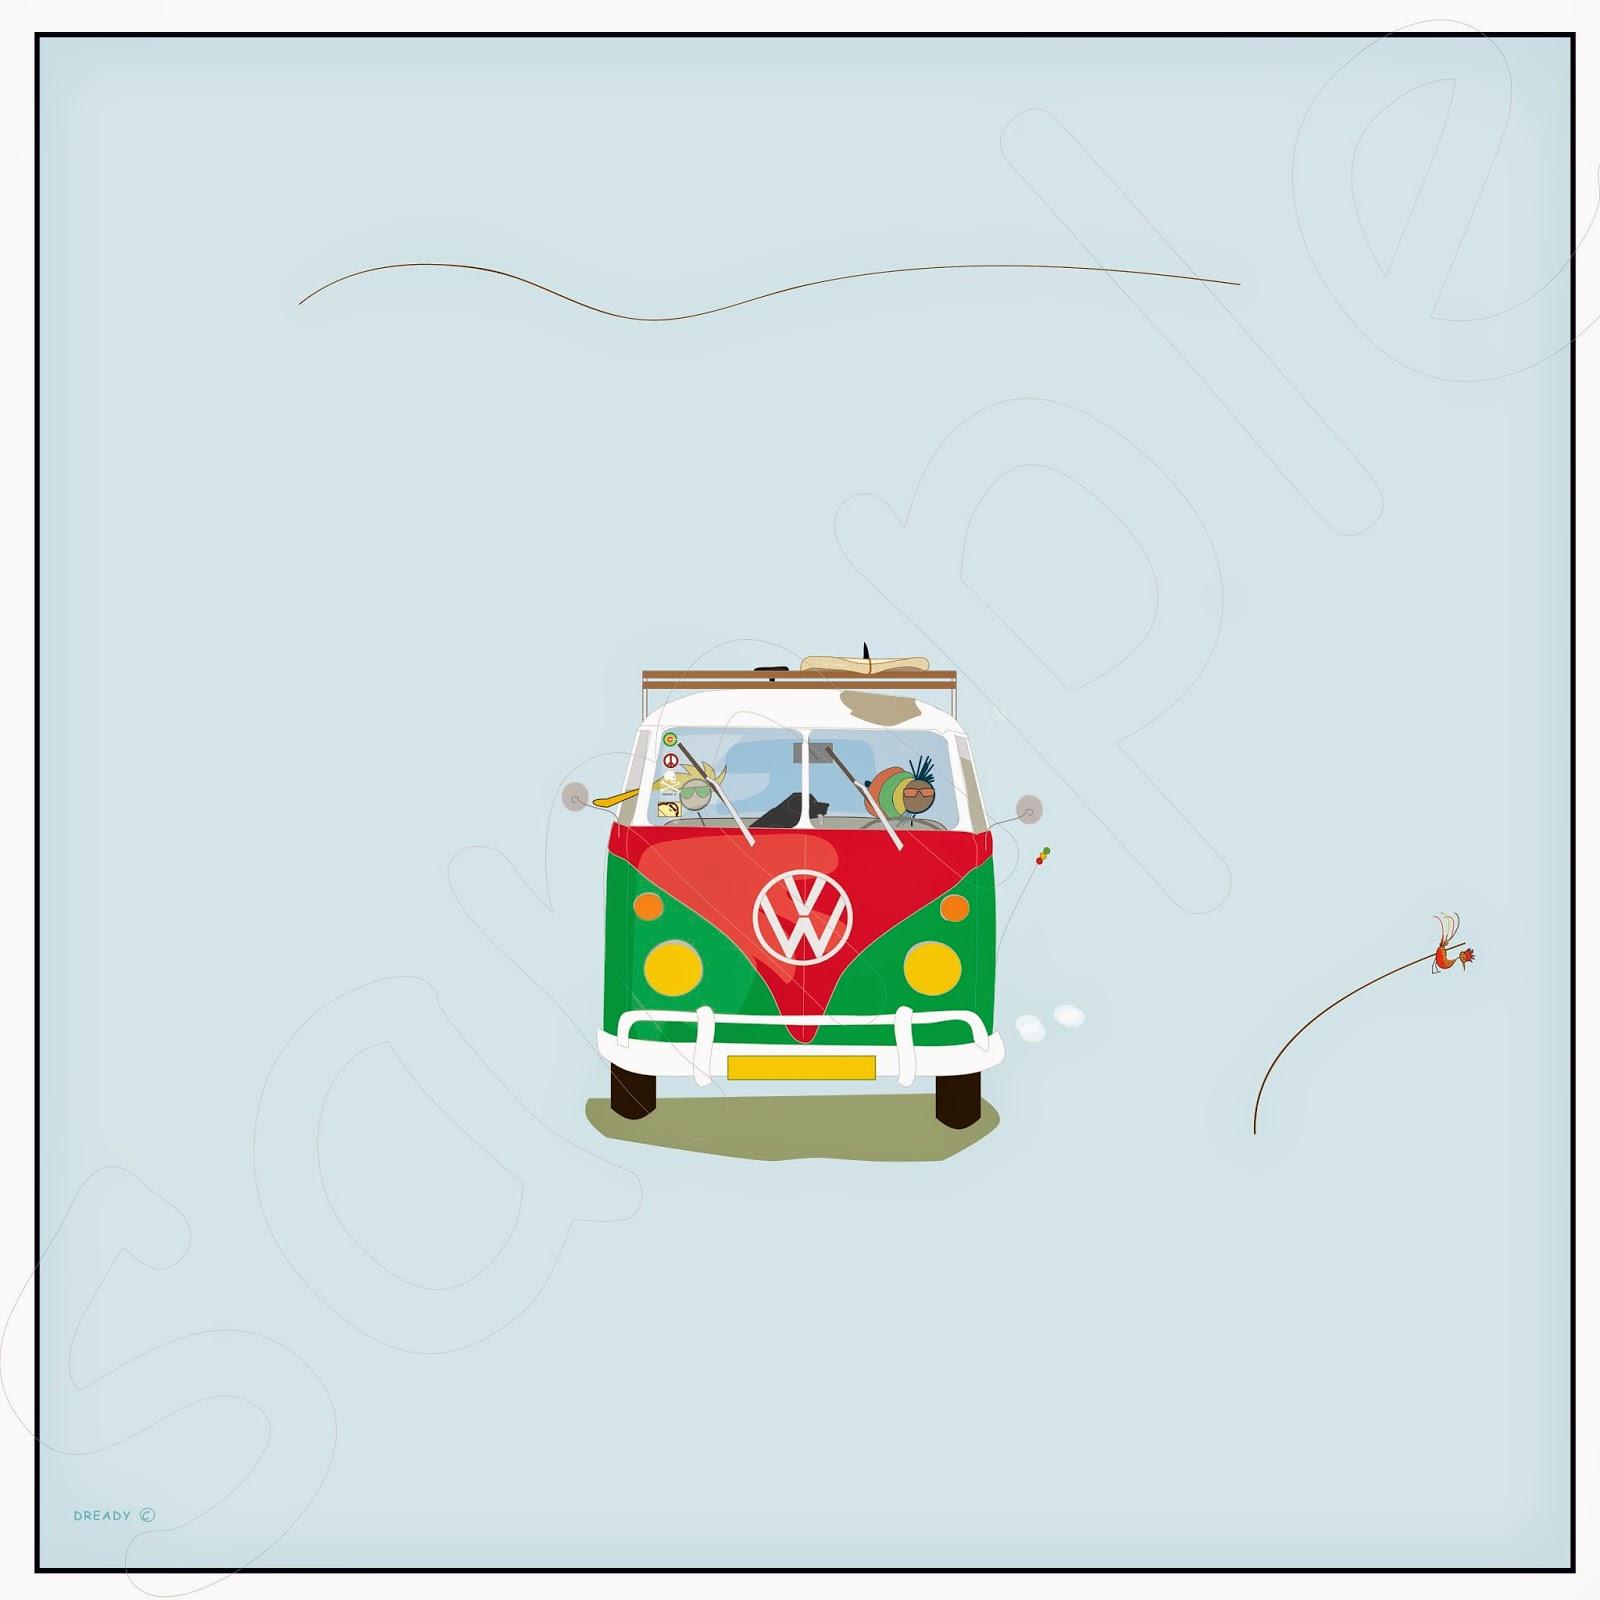 Dready, Dready Art and Everything Dready dready+1963+volkswagen+kombi+bus